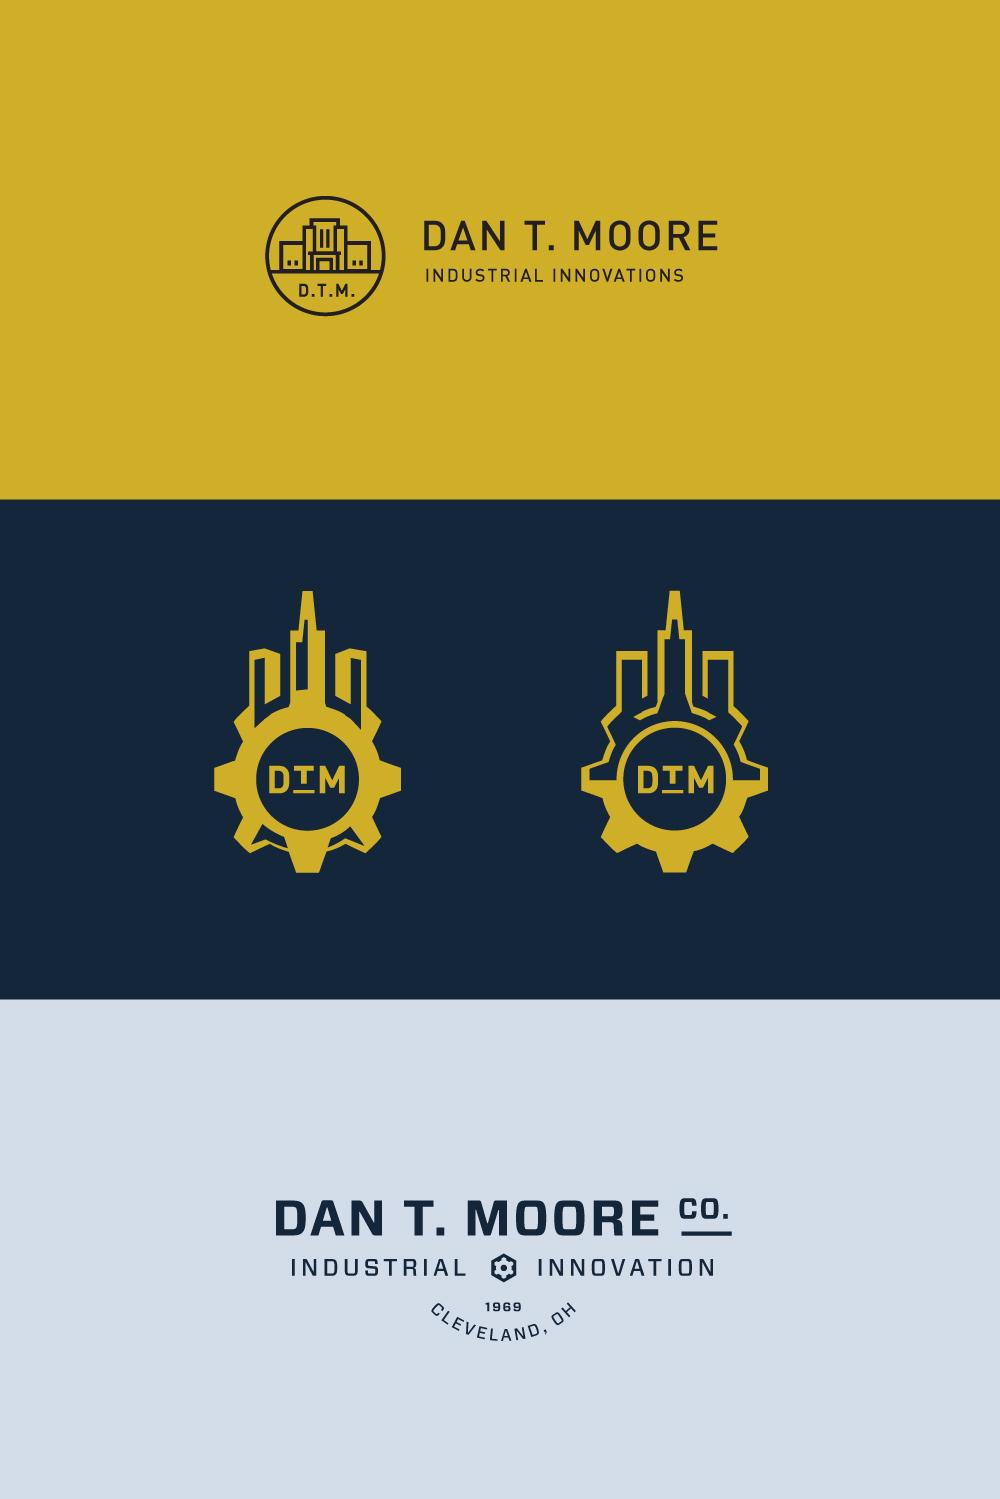 Dan T. Moore Alternates